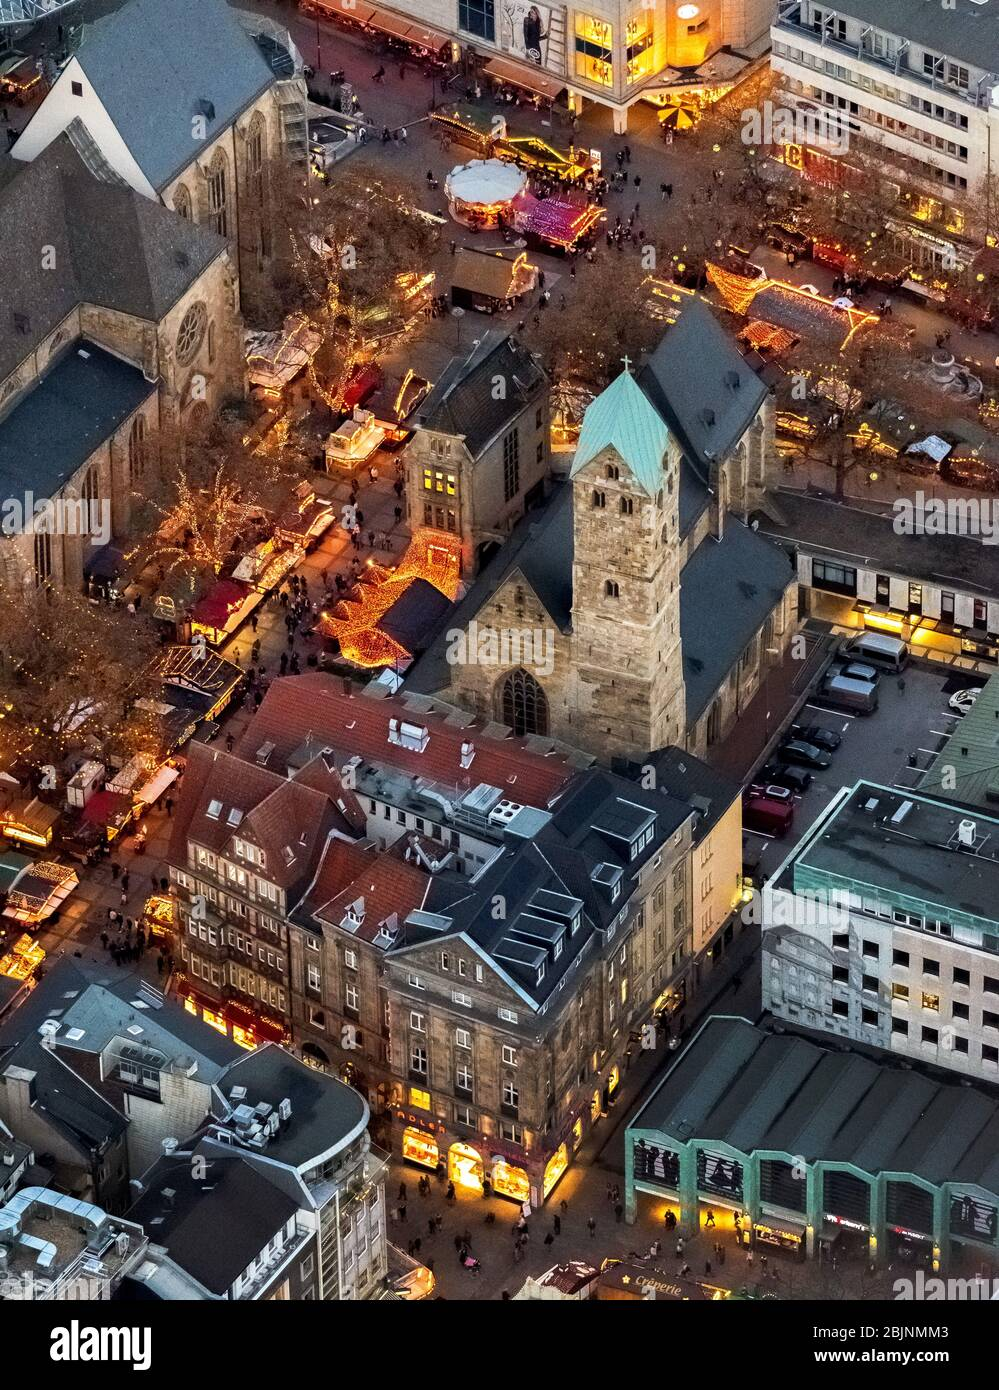 Marché de noël sur Otenhellweg à Dortmund, 23.11.2016, vue aérienne, Allemagne, Rhénanie-du-Nord-Westphalie, Ruhr Area, Dortmund Banque D'Images